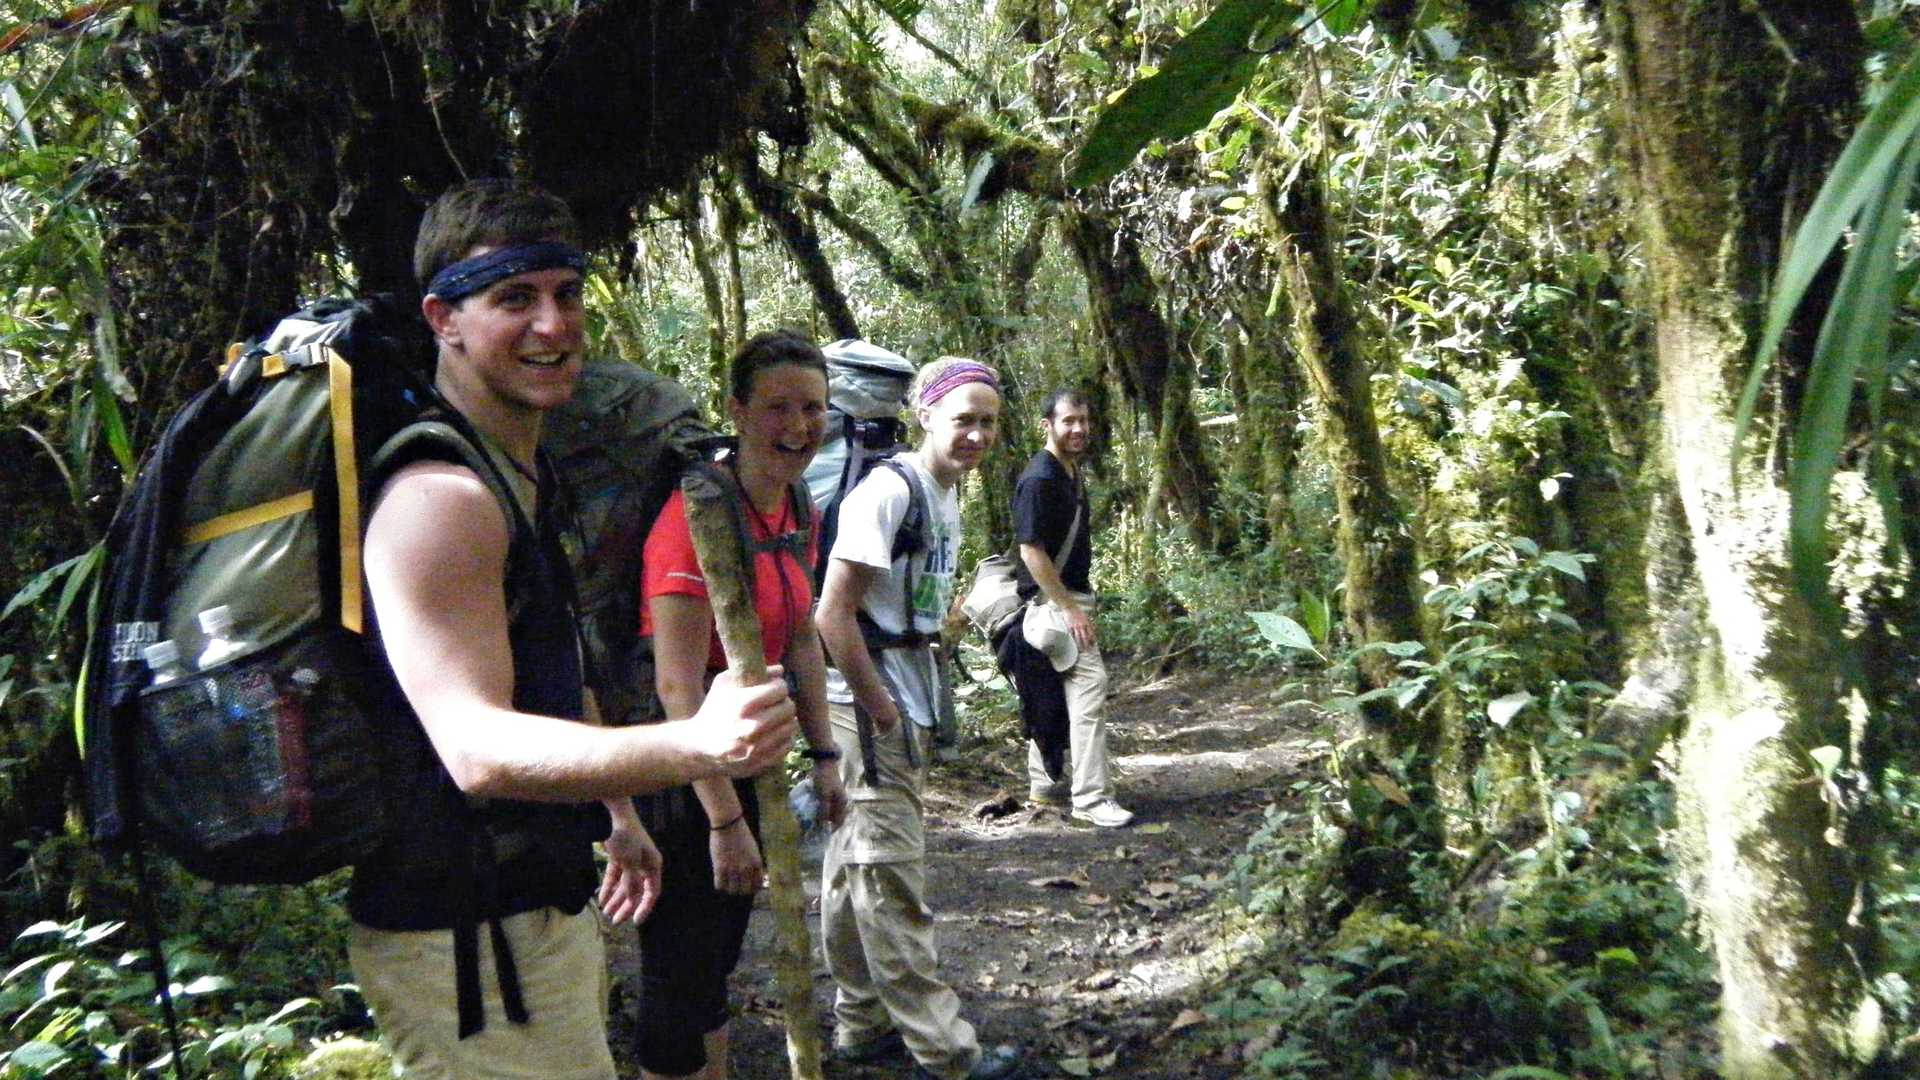 pie experiences Trekking Group on the Inca Jungle Trail to Machu Picchu